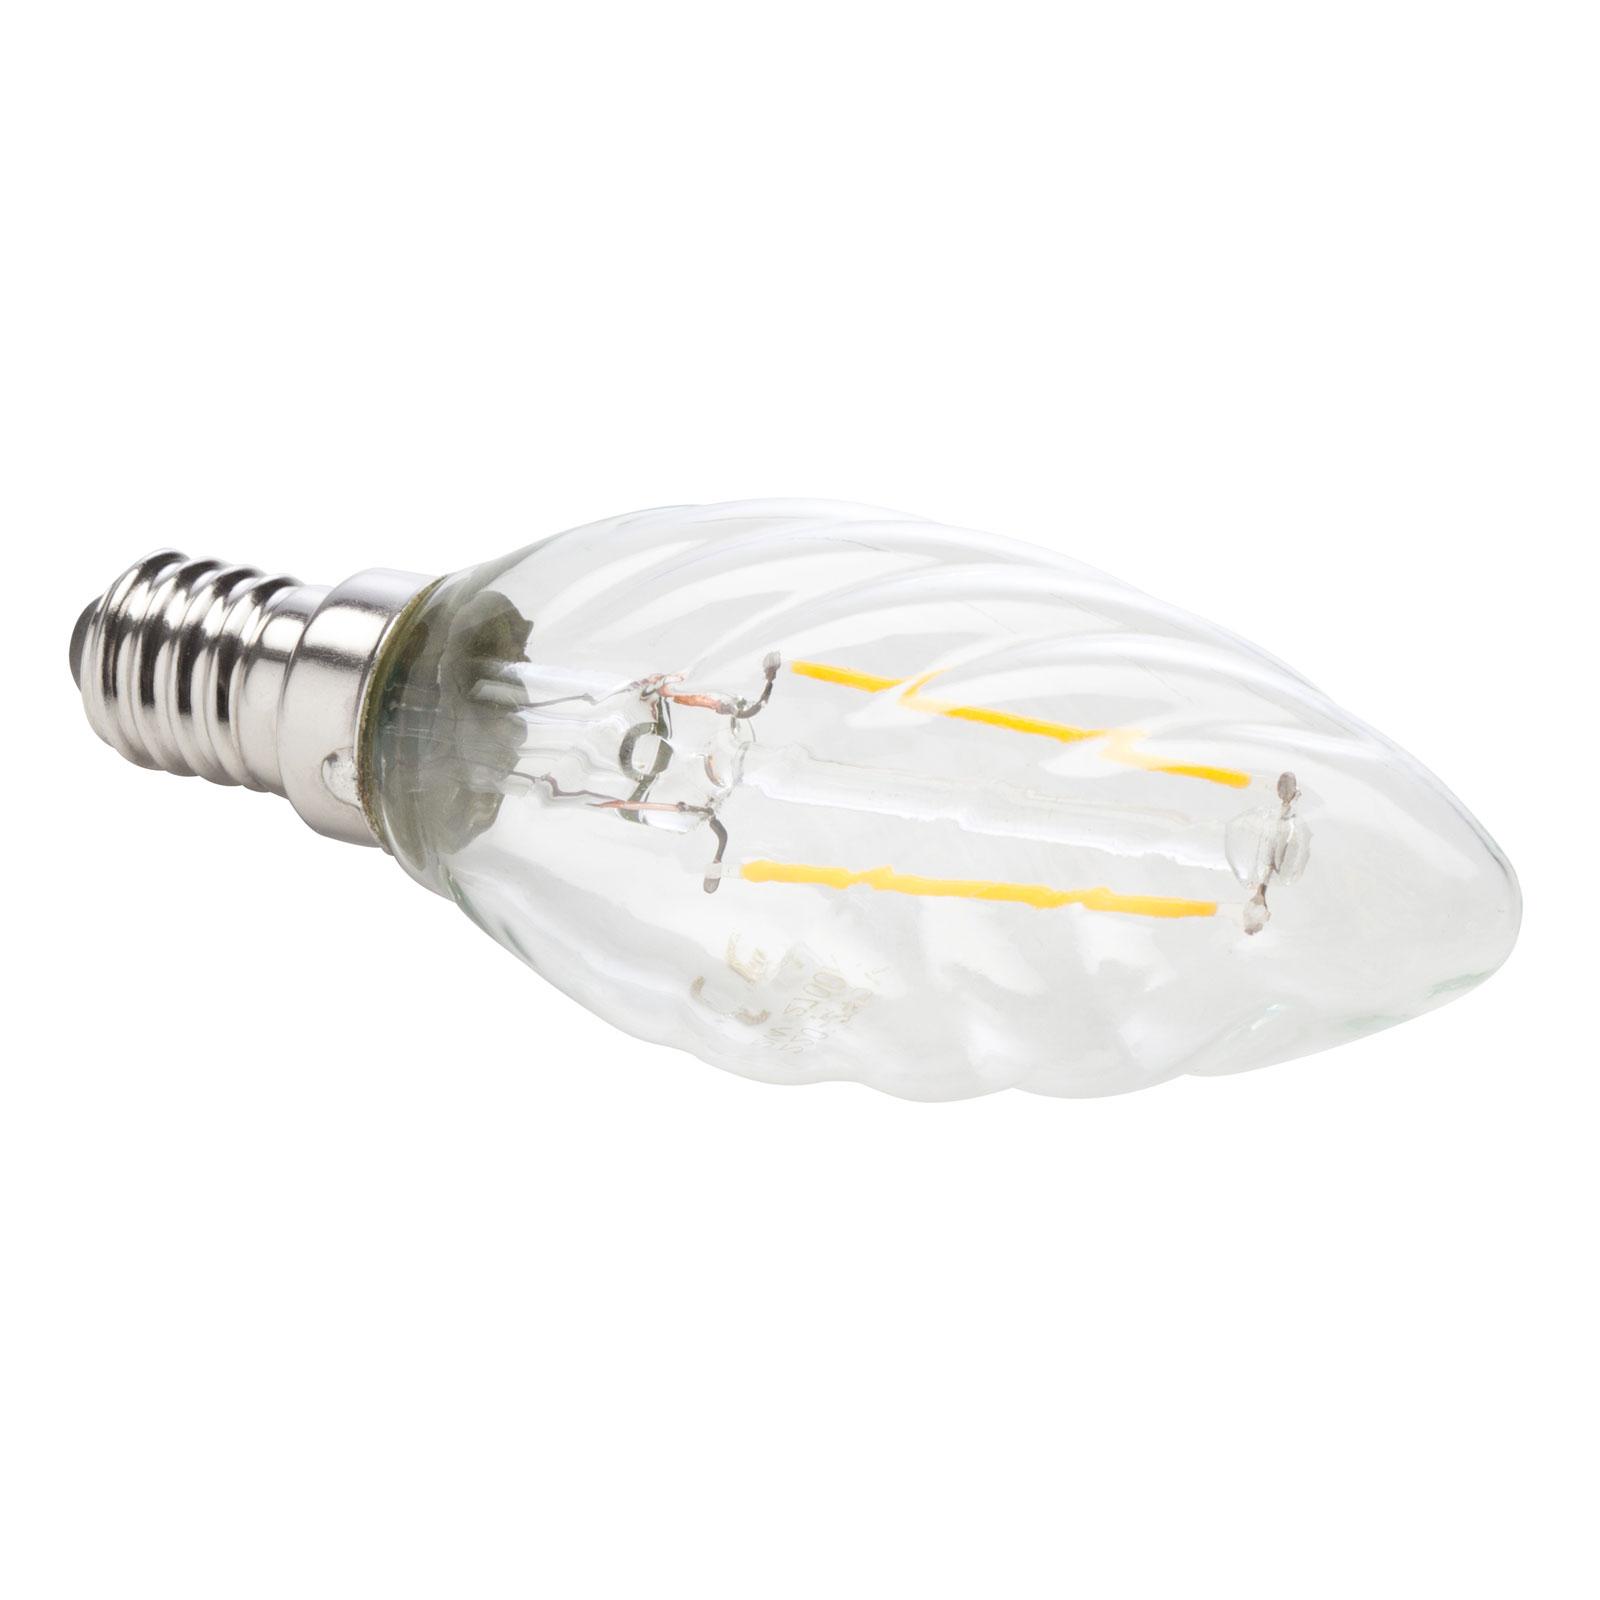 LED E14 4,5W 927 trasparente candela ritorta